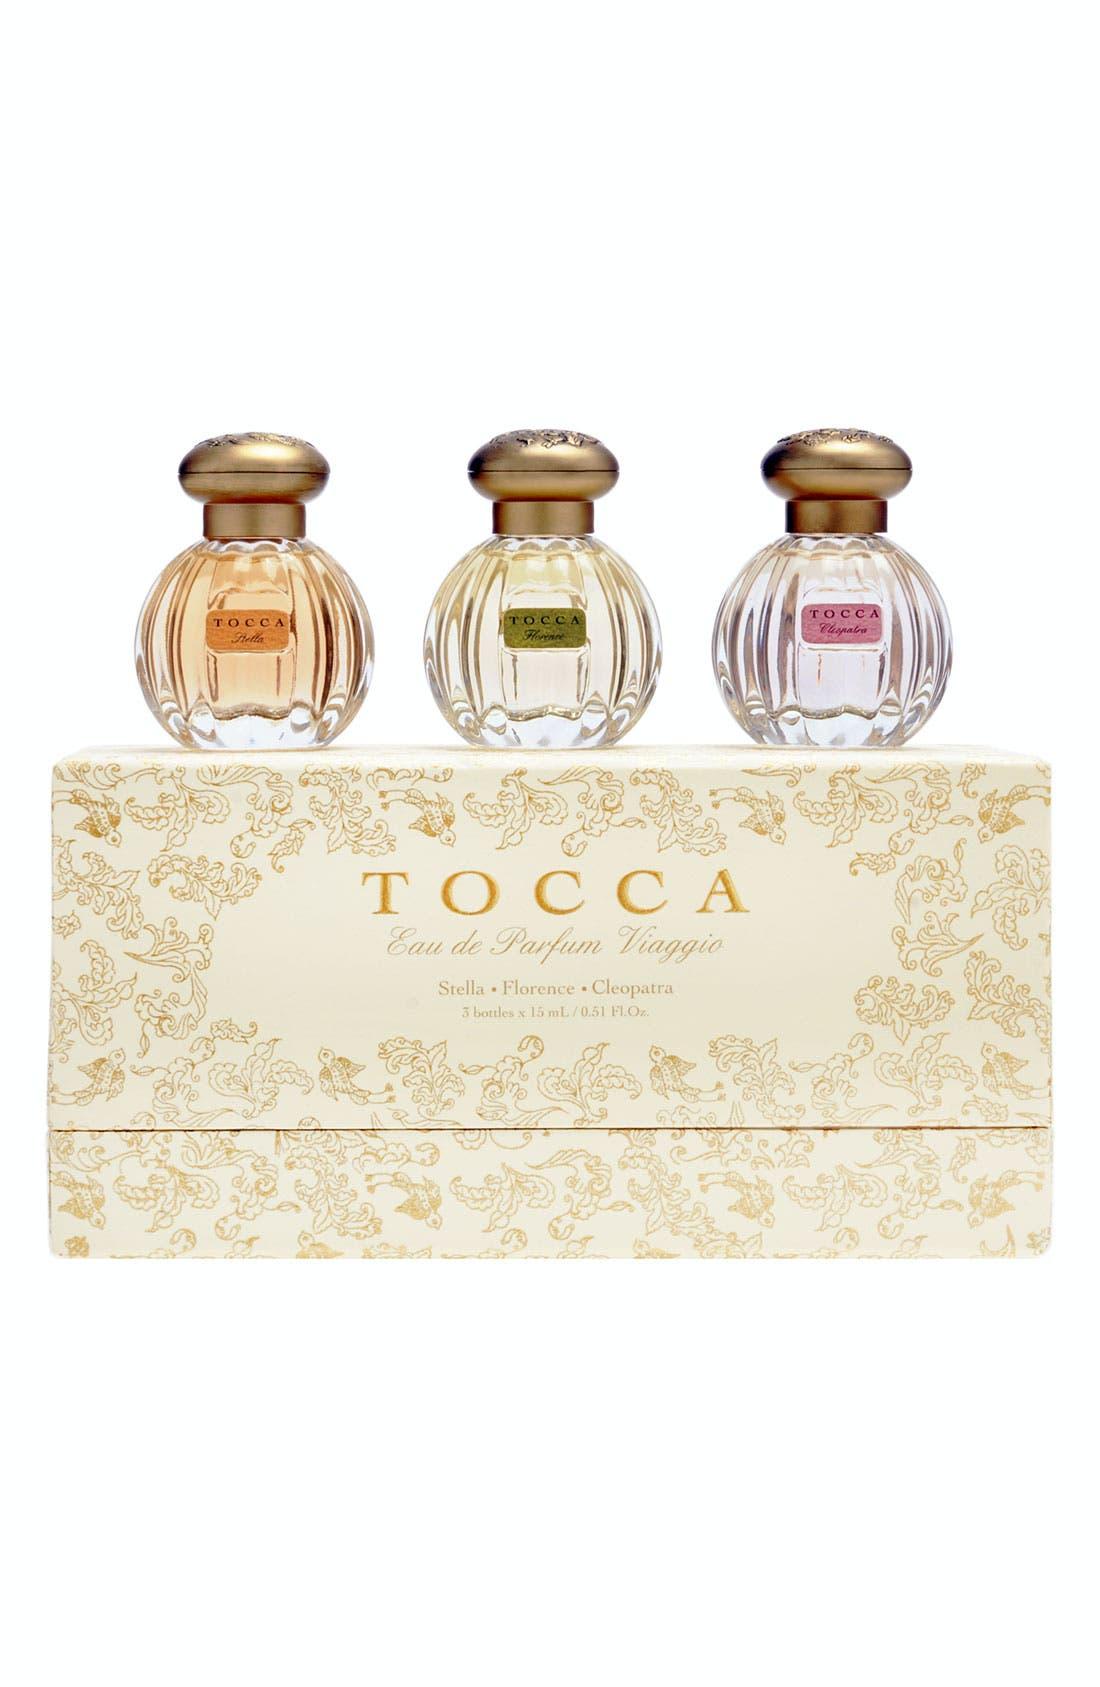 TOCCA Eau de Parfum Viaggio Travel Fragrance Set